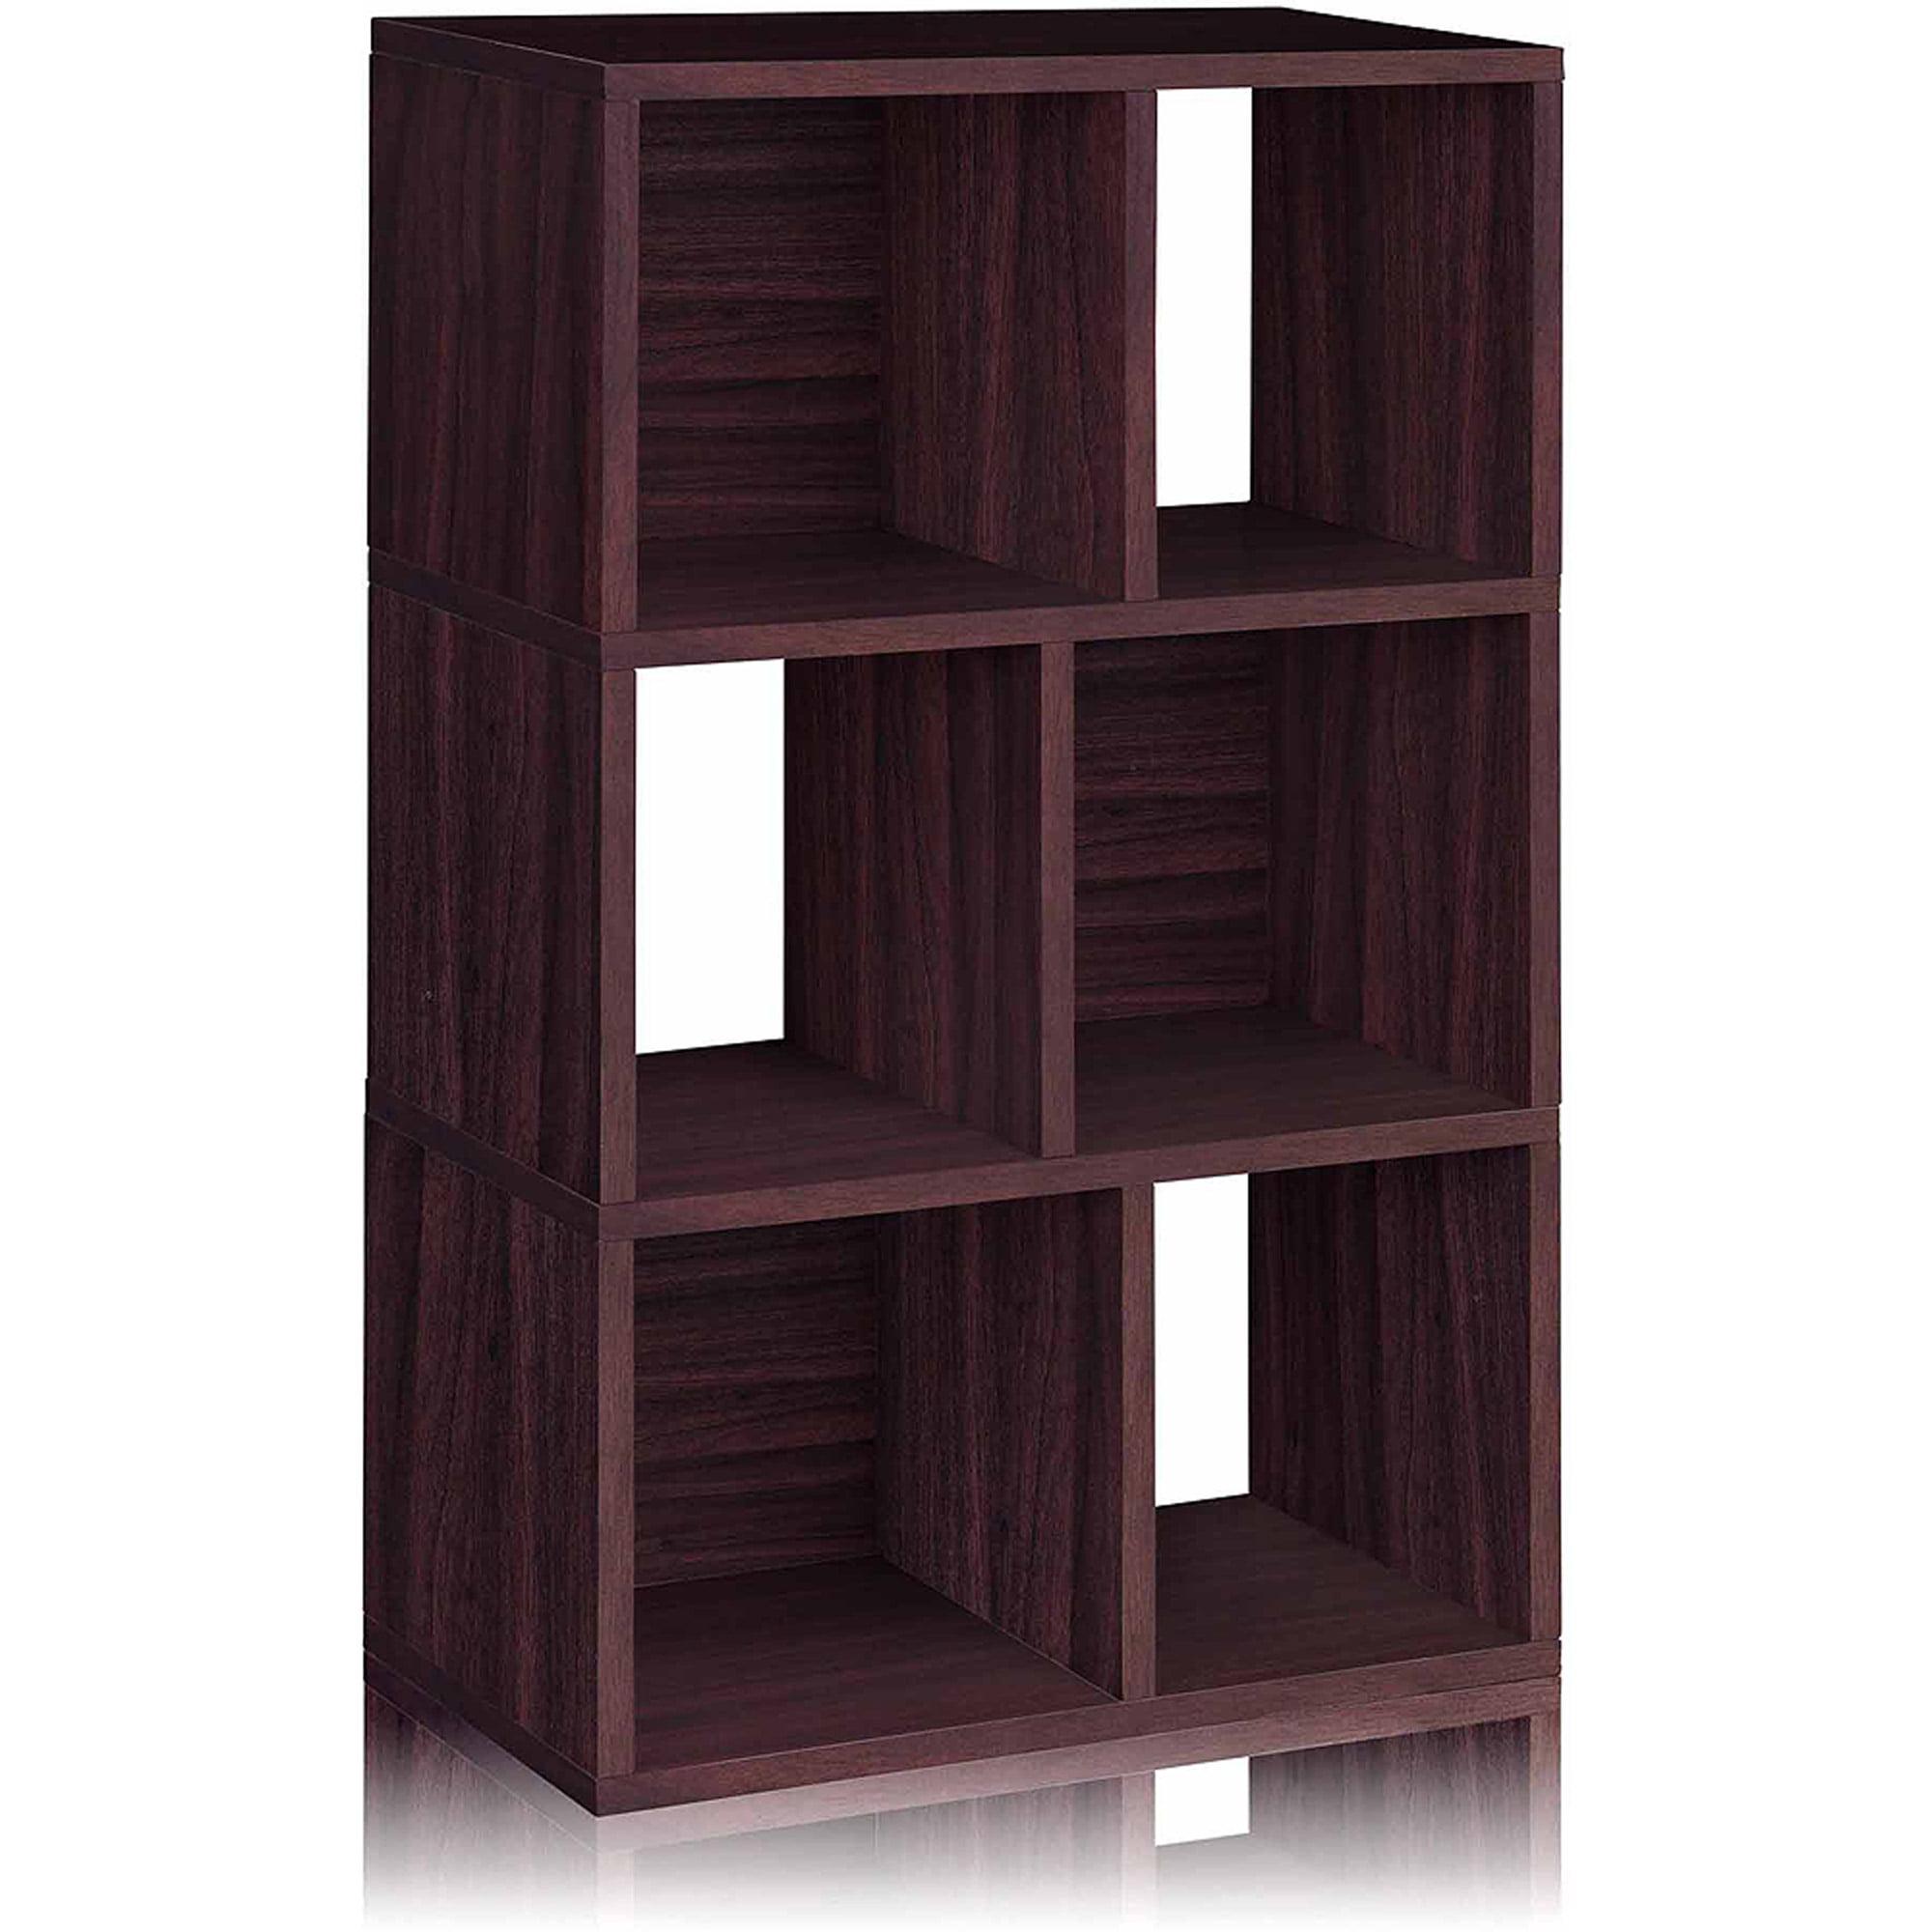 Way Basics Eco 3-Shelf Laguna Bookcase and Cubby Storage, Espresso